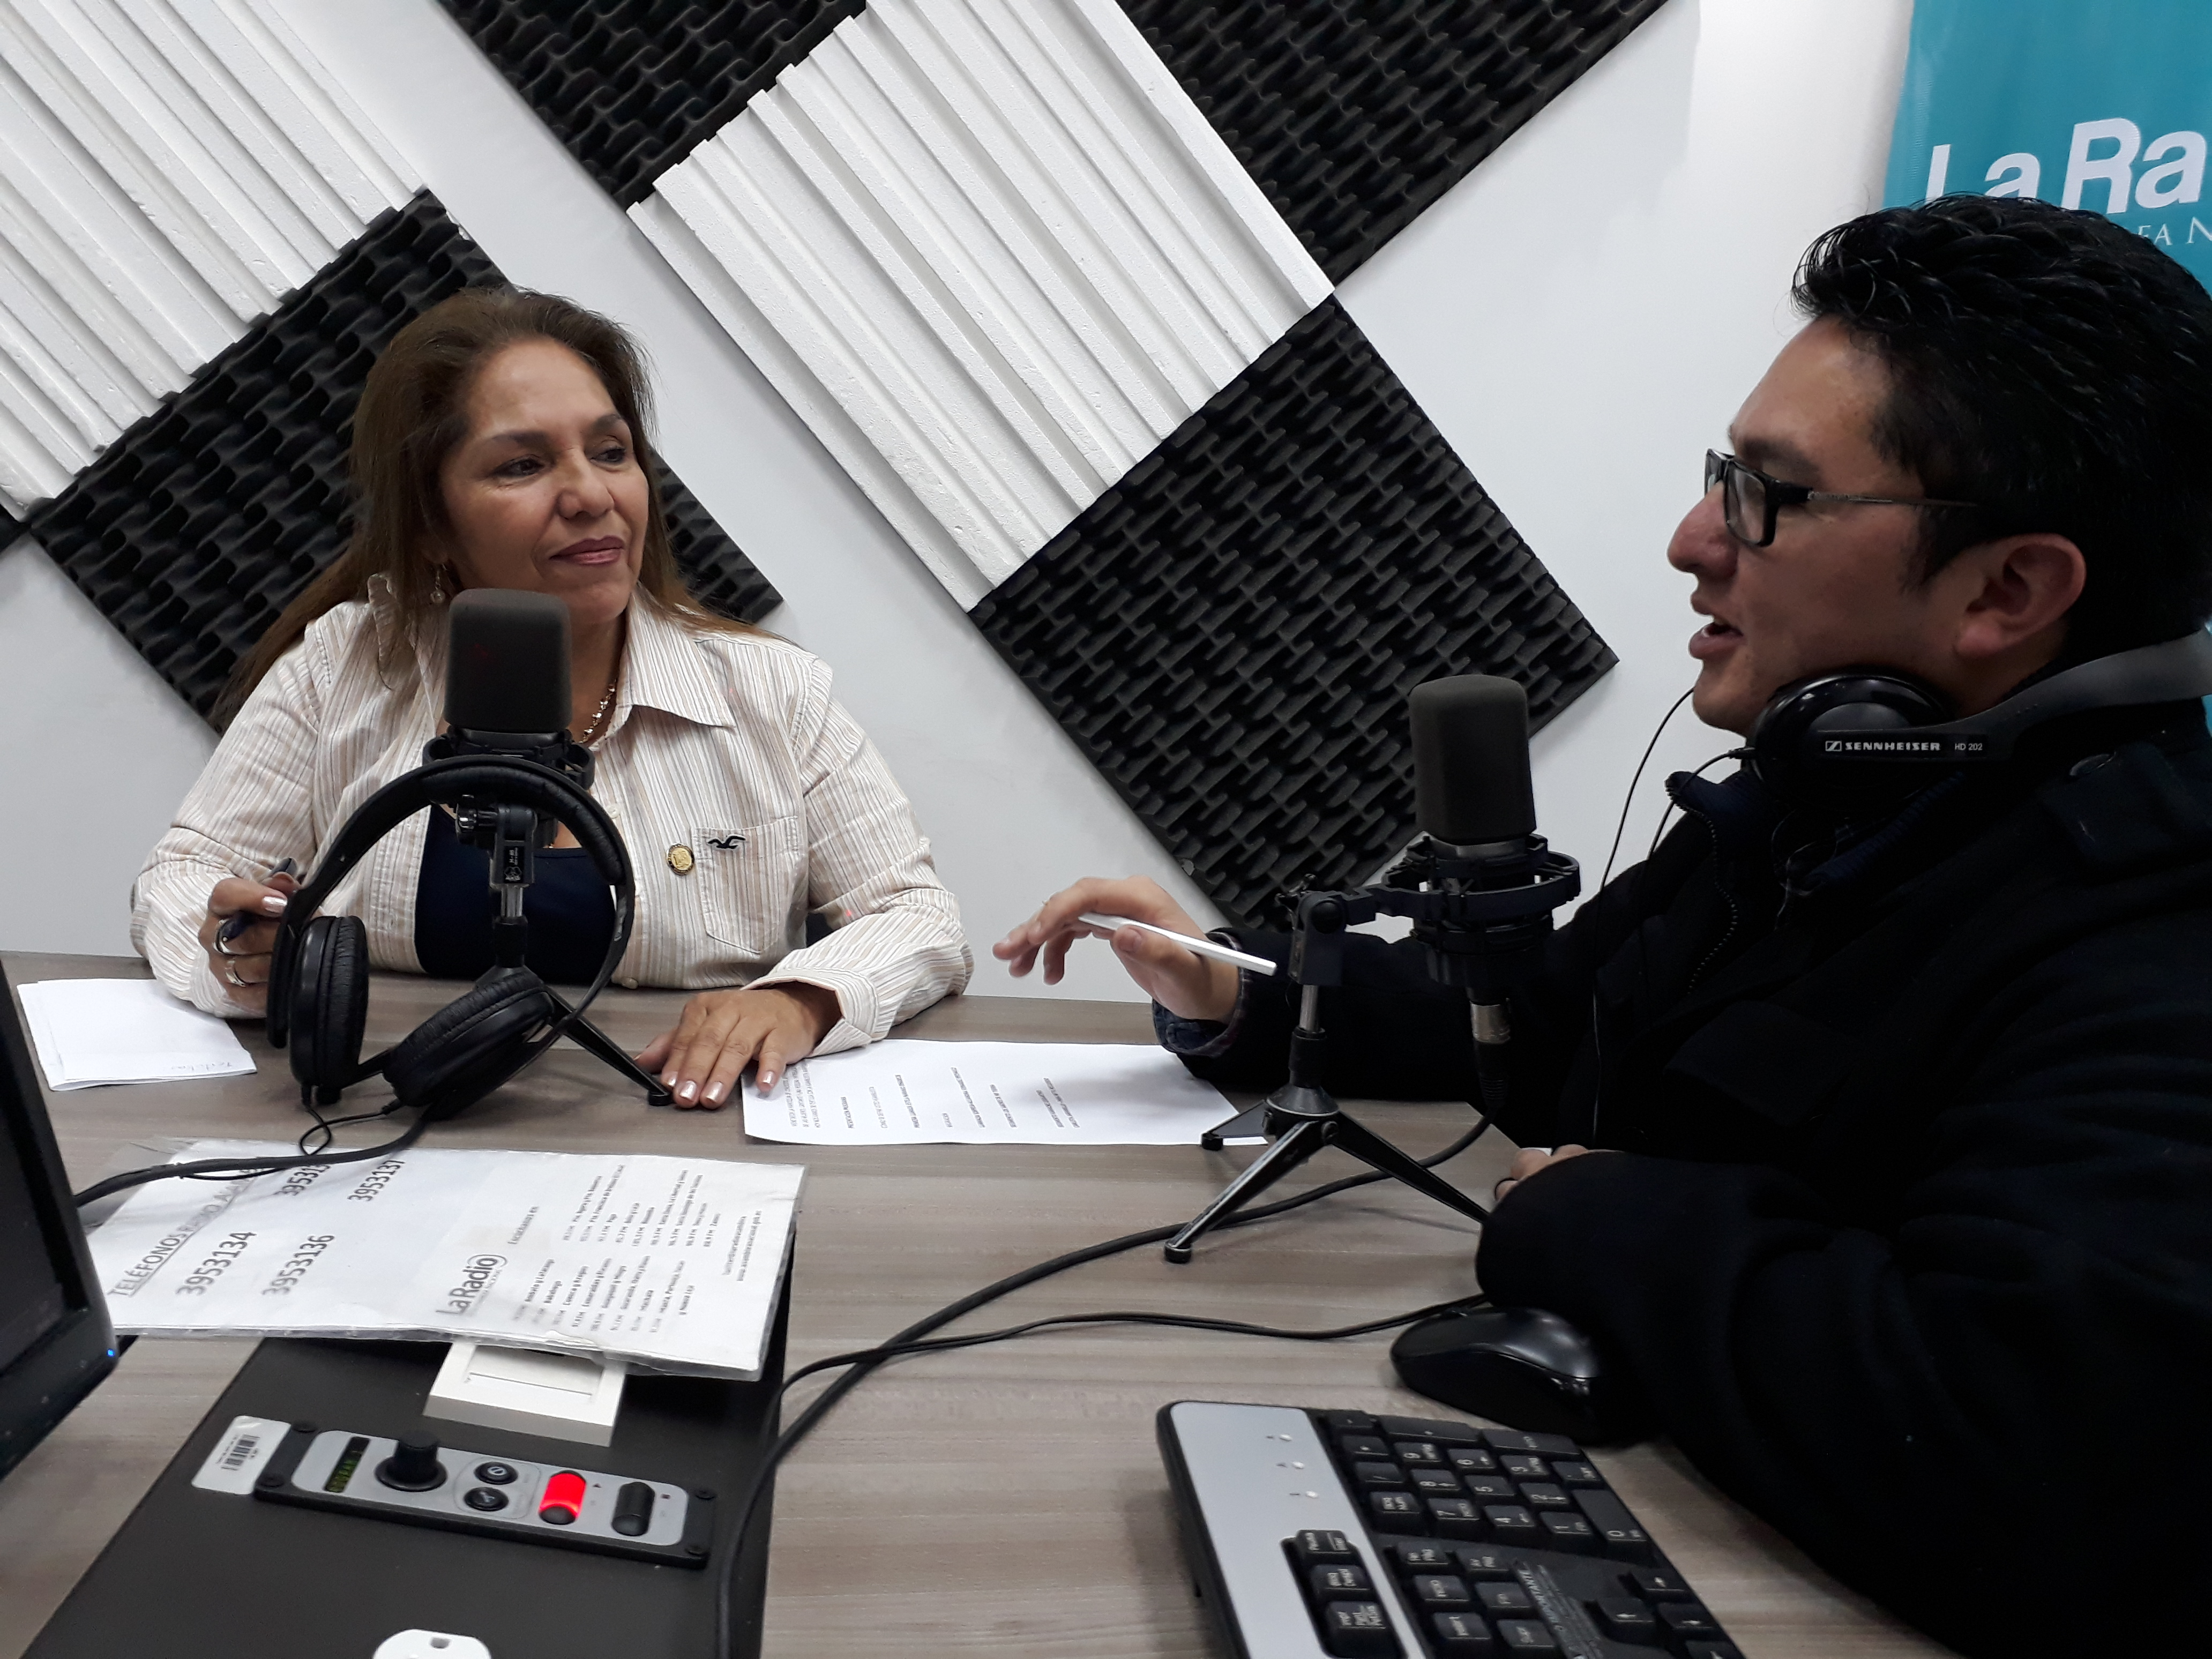 Amapola Naranjo: La mejor voz de la Asamblea Nacional